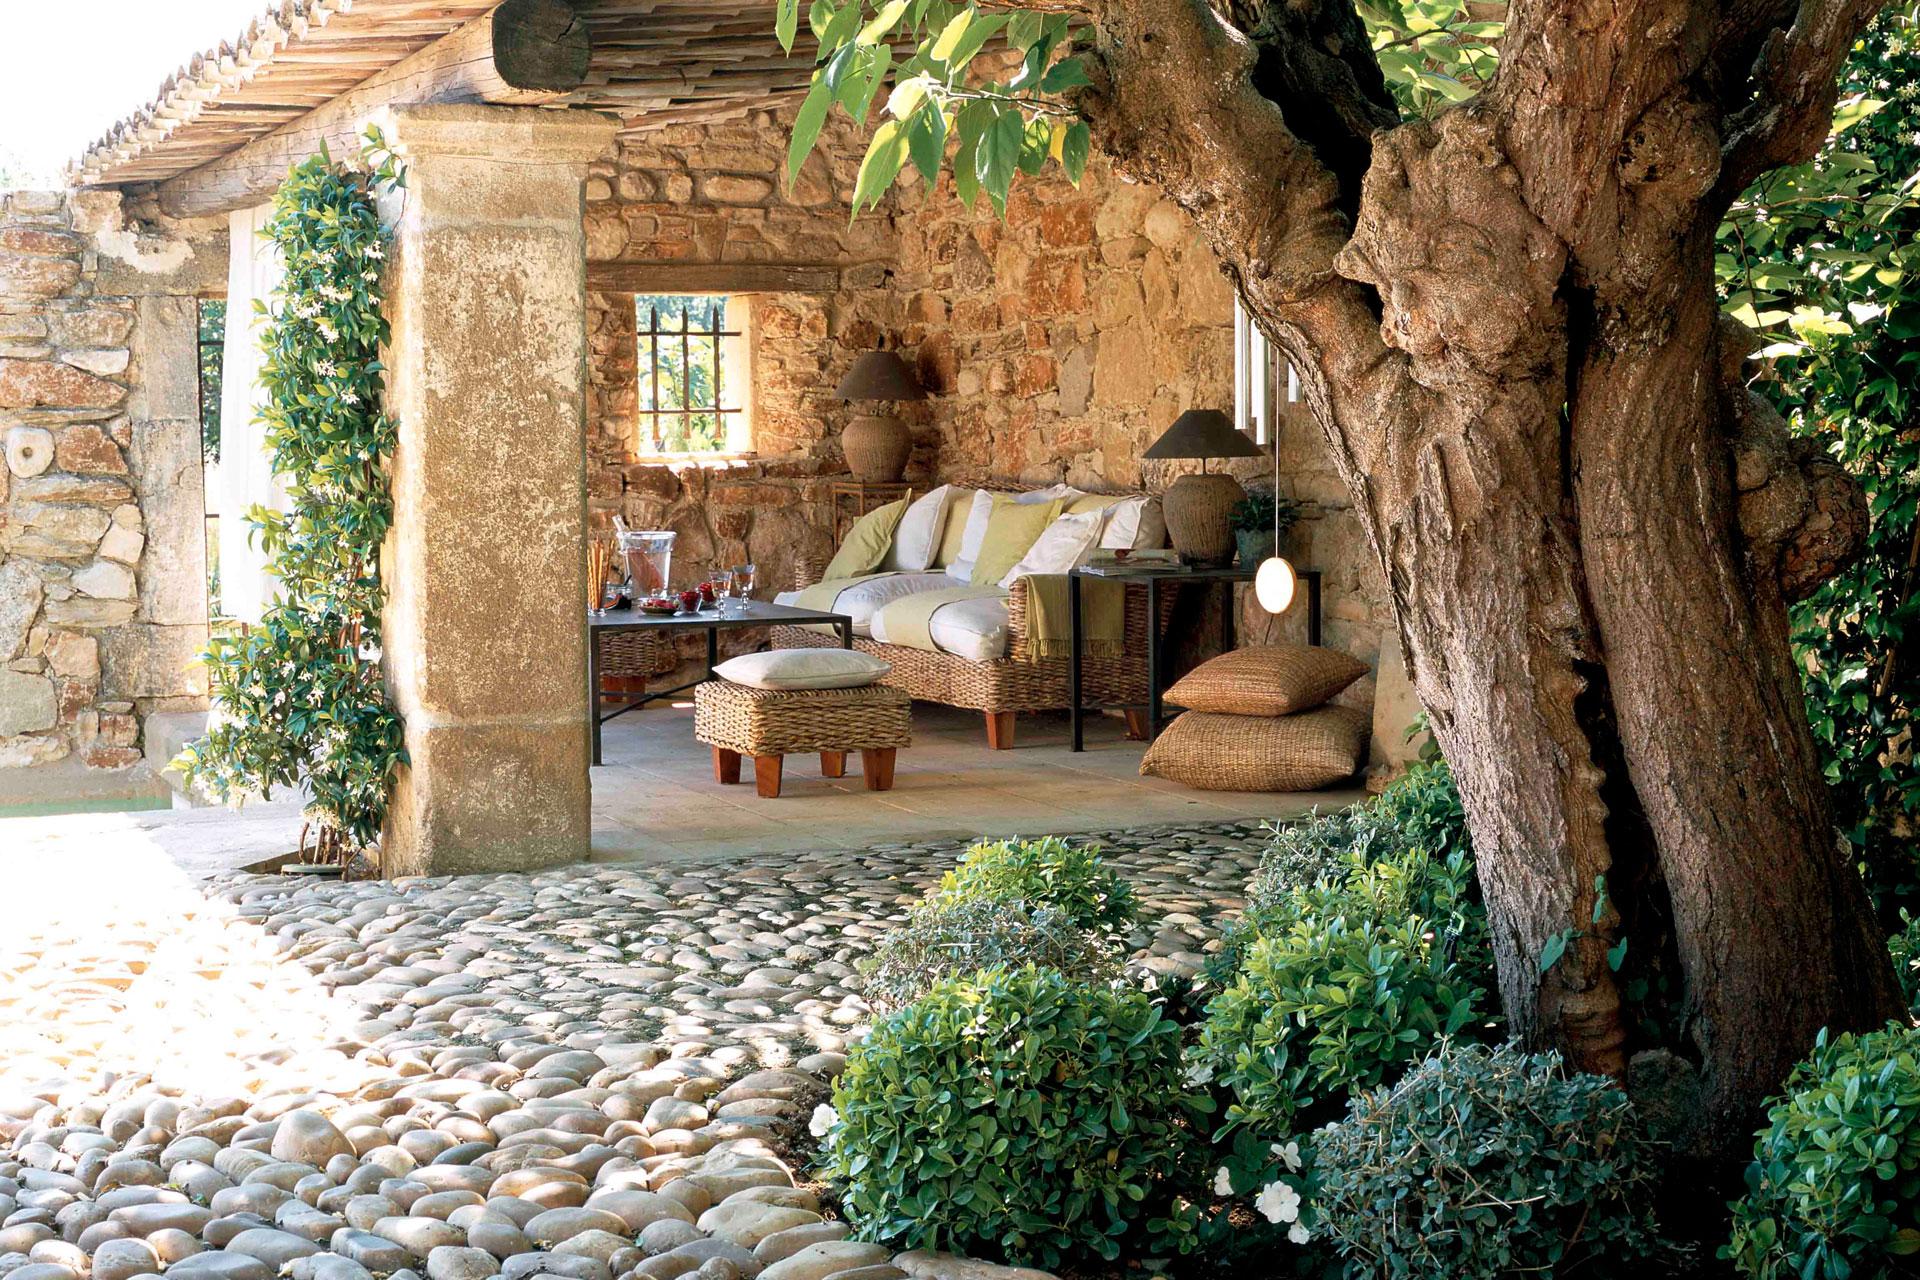 Provence-i varázs